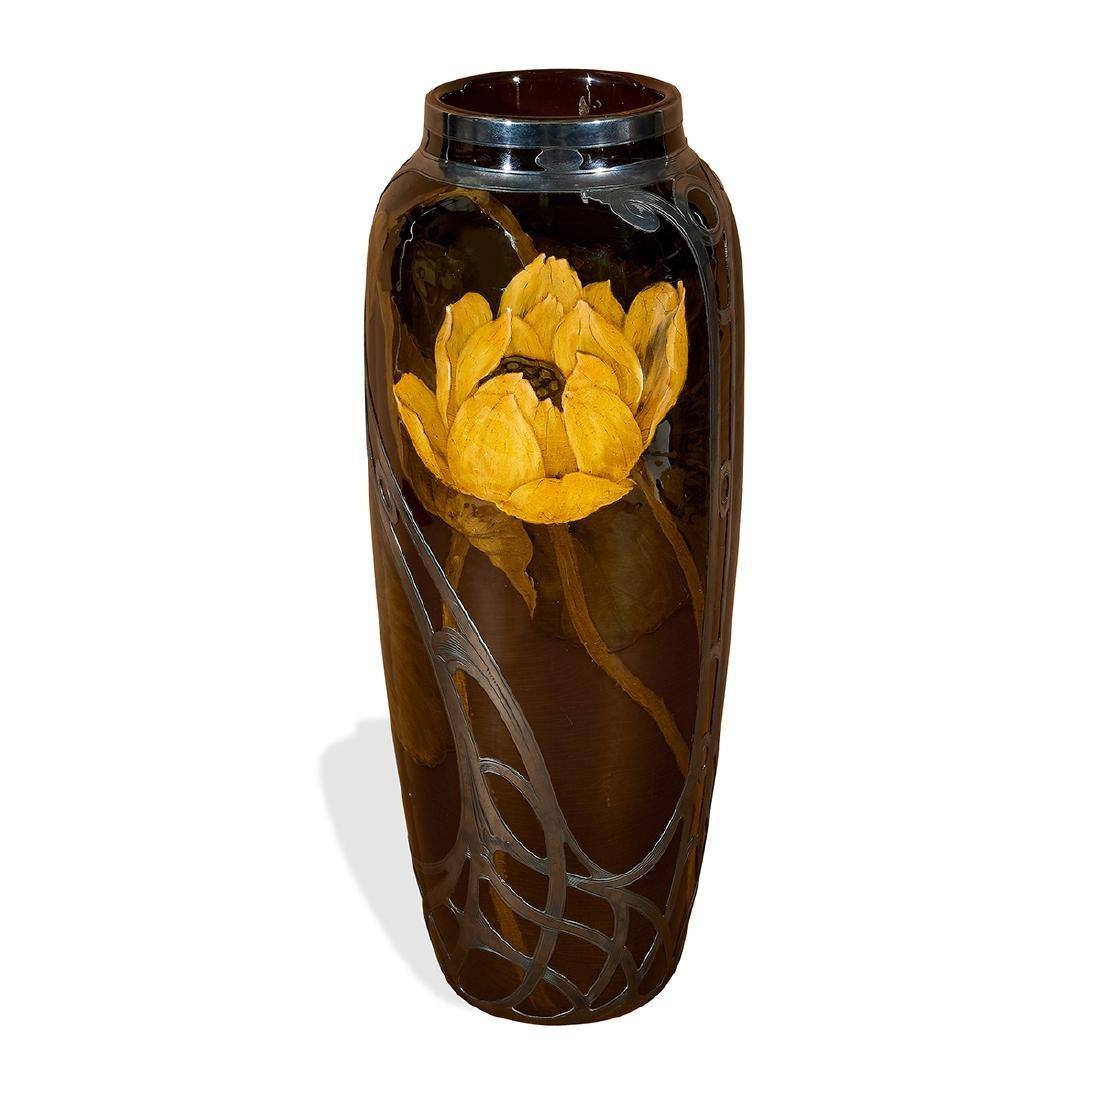 Rookwood, Matt Daly, Gorham Silver Overlay Vase